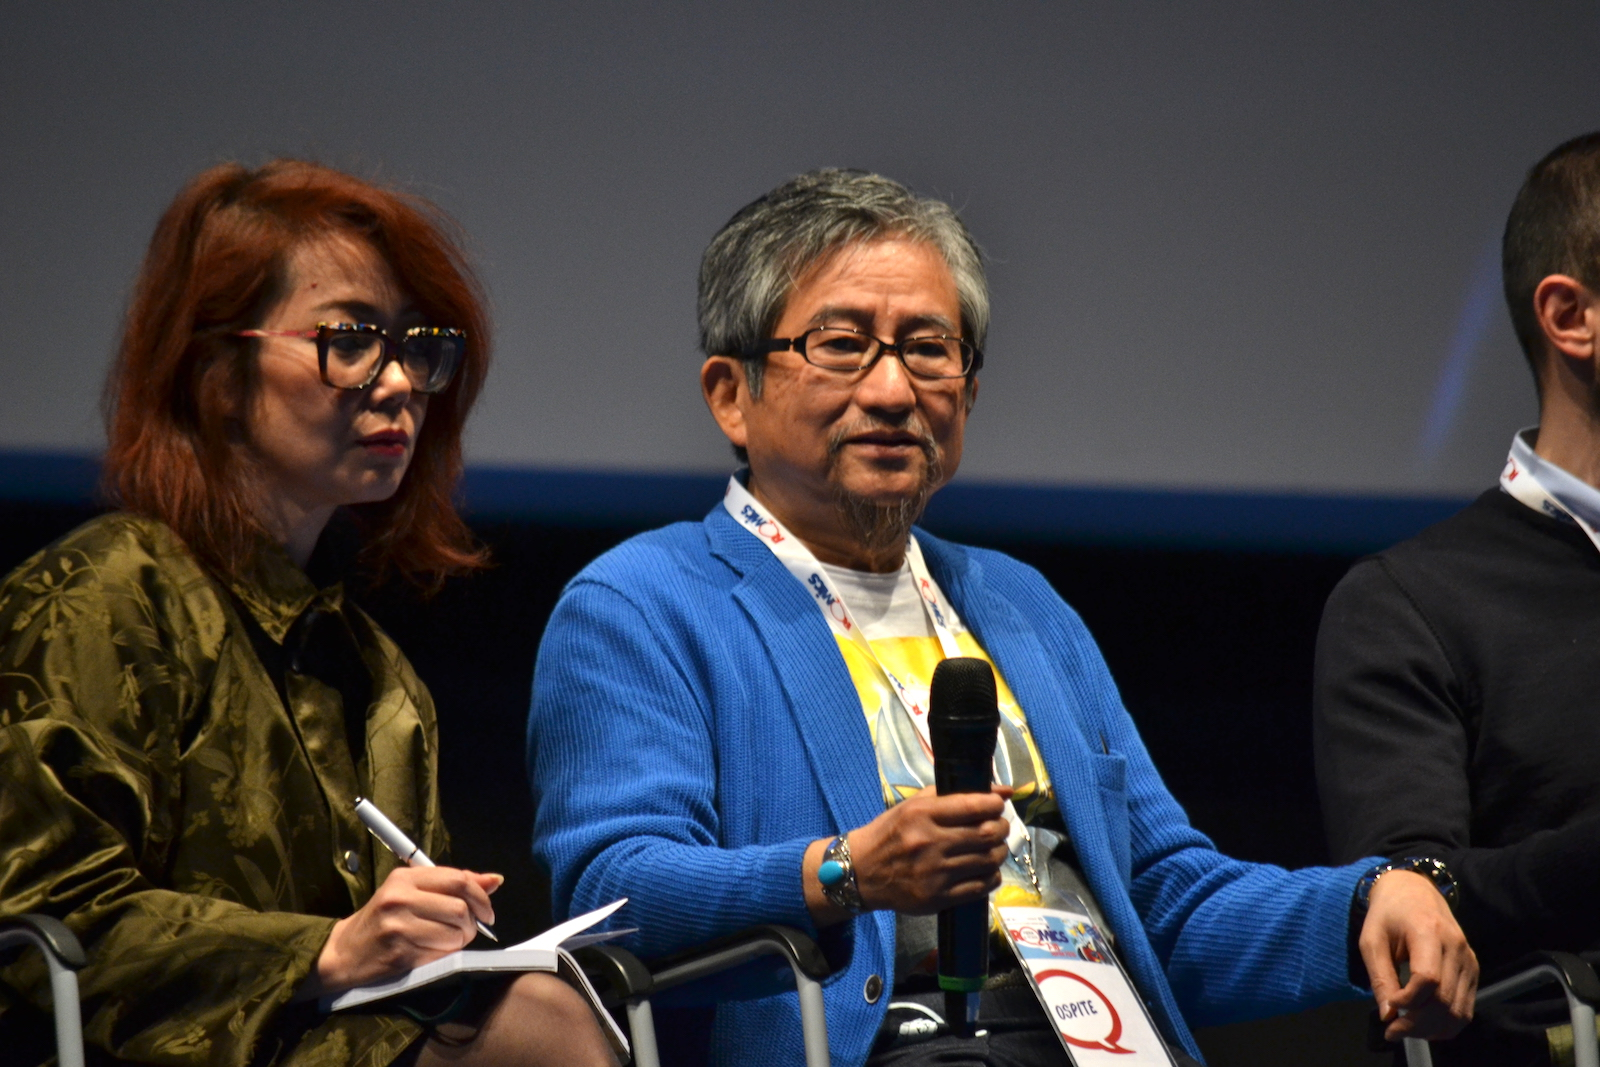 Romics 2016: Go Nagai durante l'incontro a lui dedicato